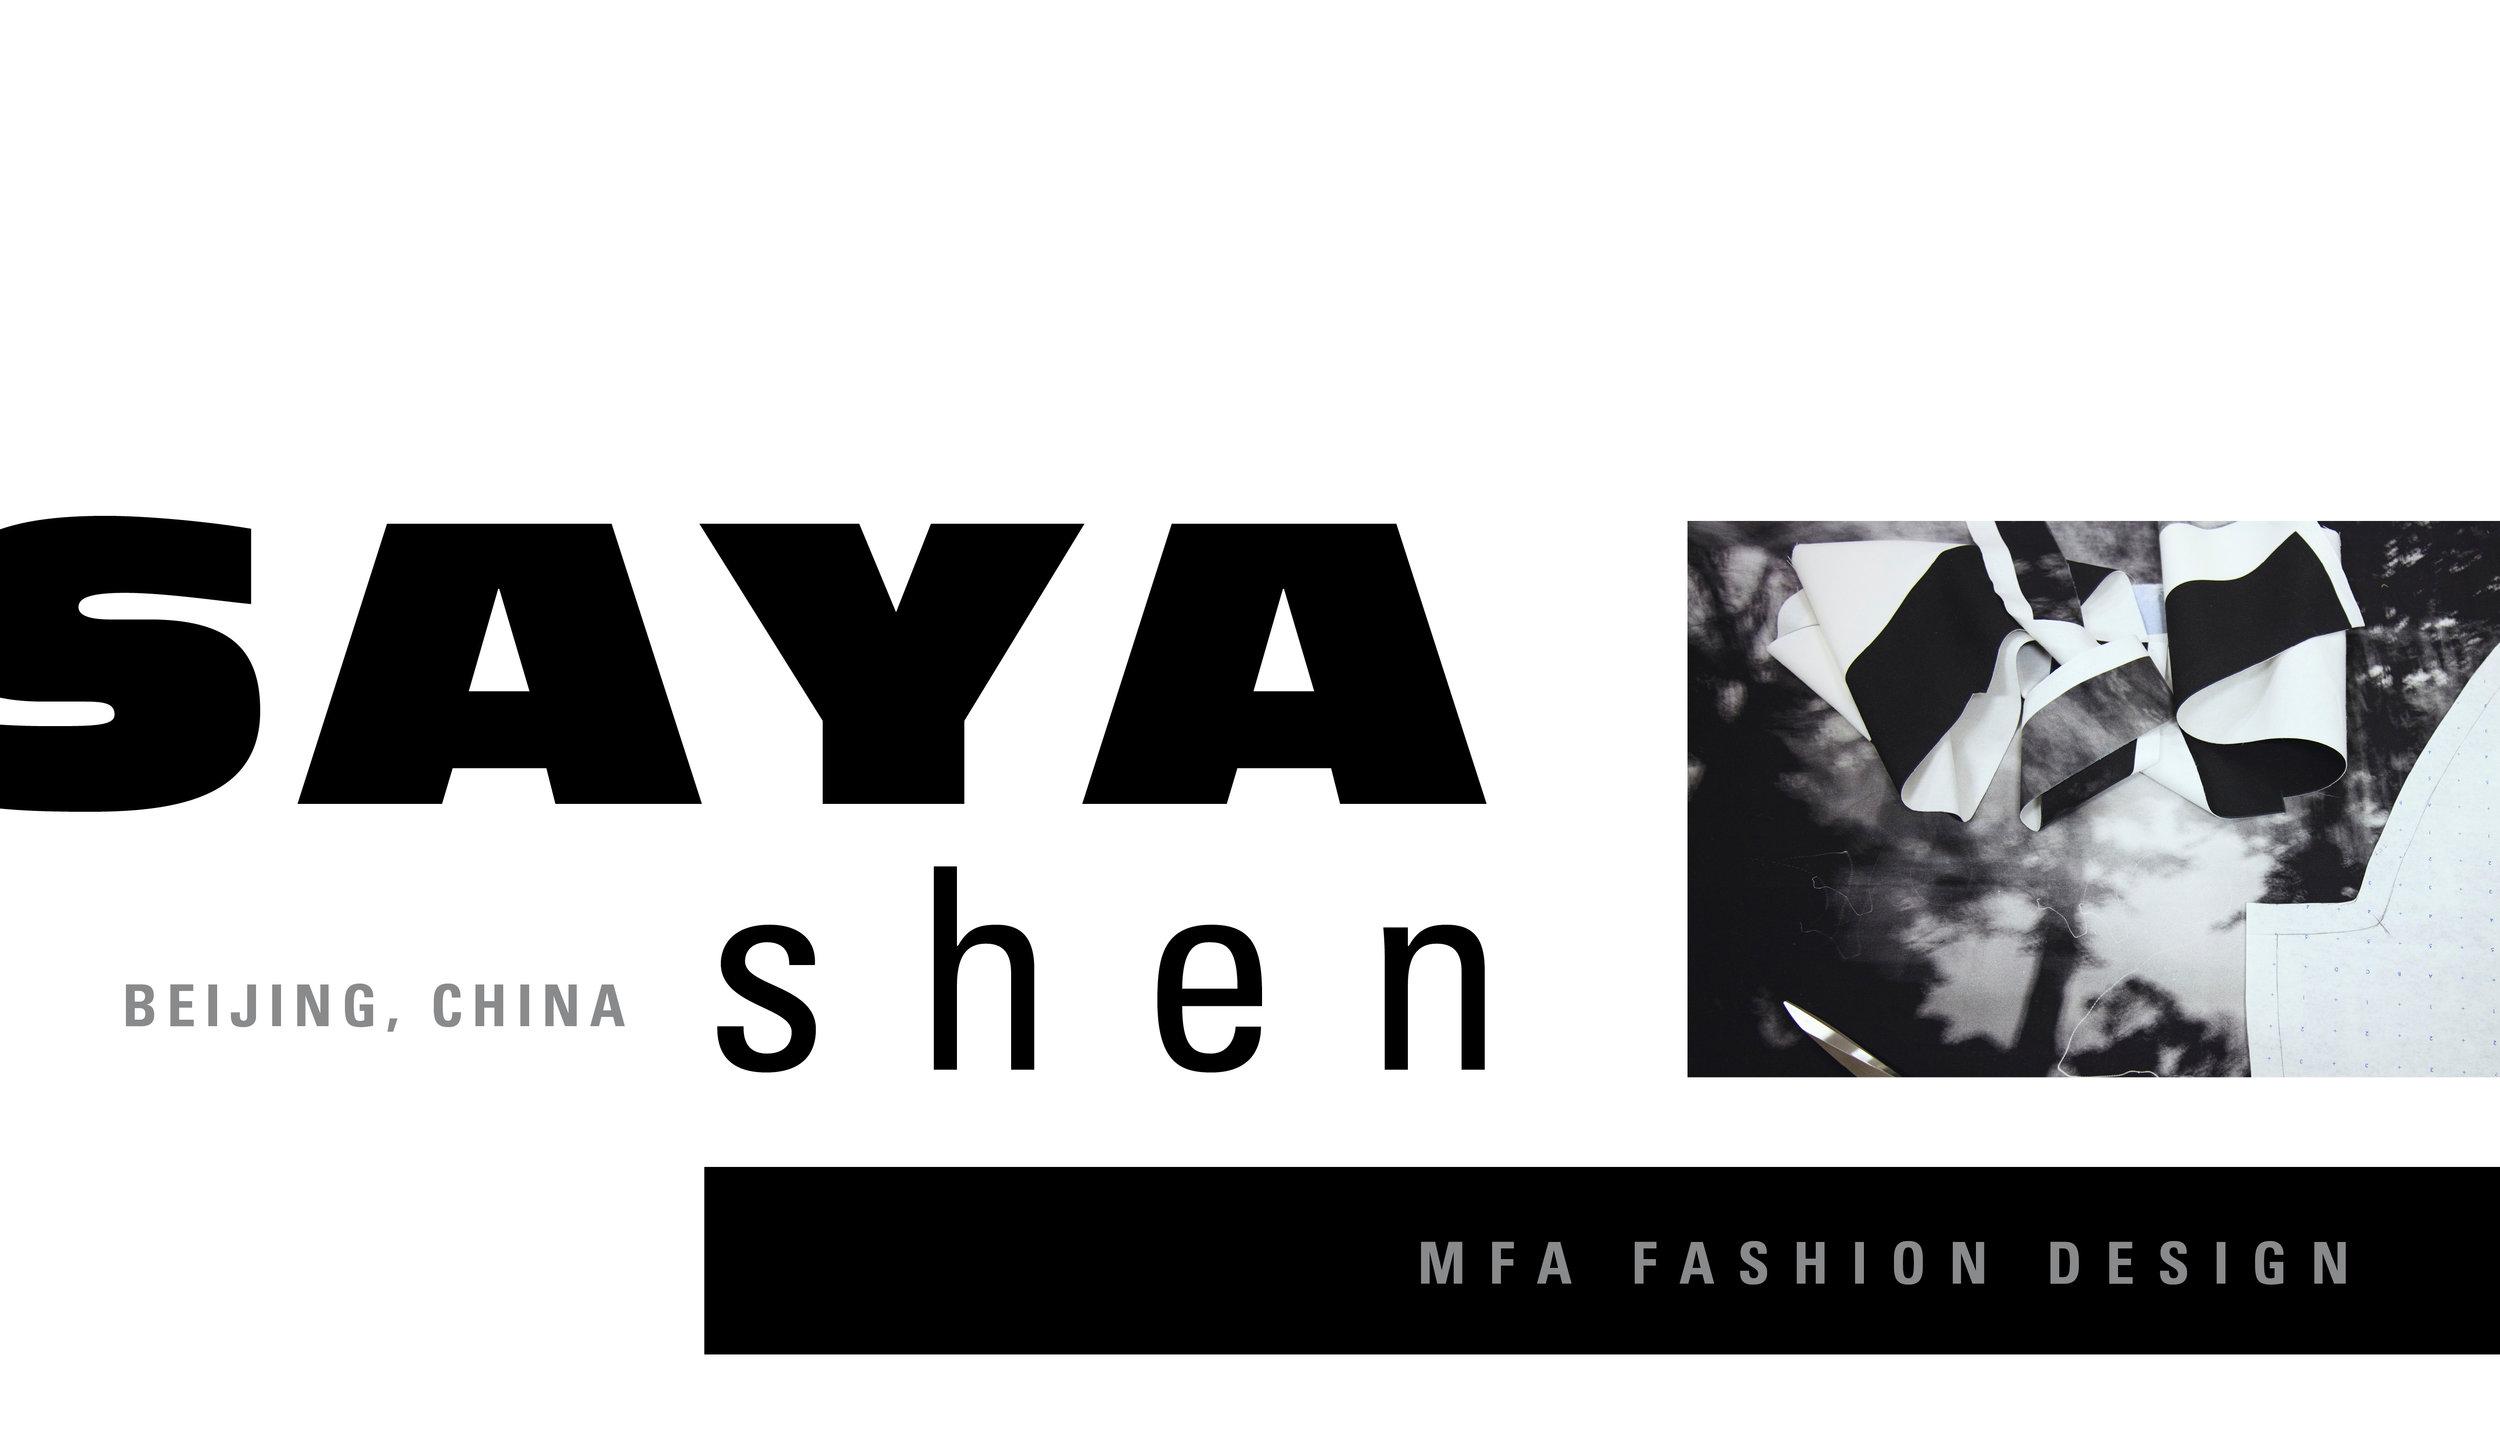 nyfw_saya-shen_5a.jpg